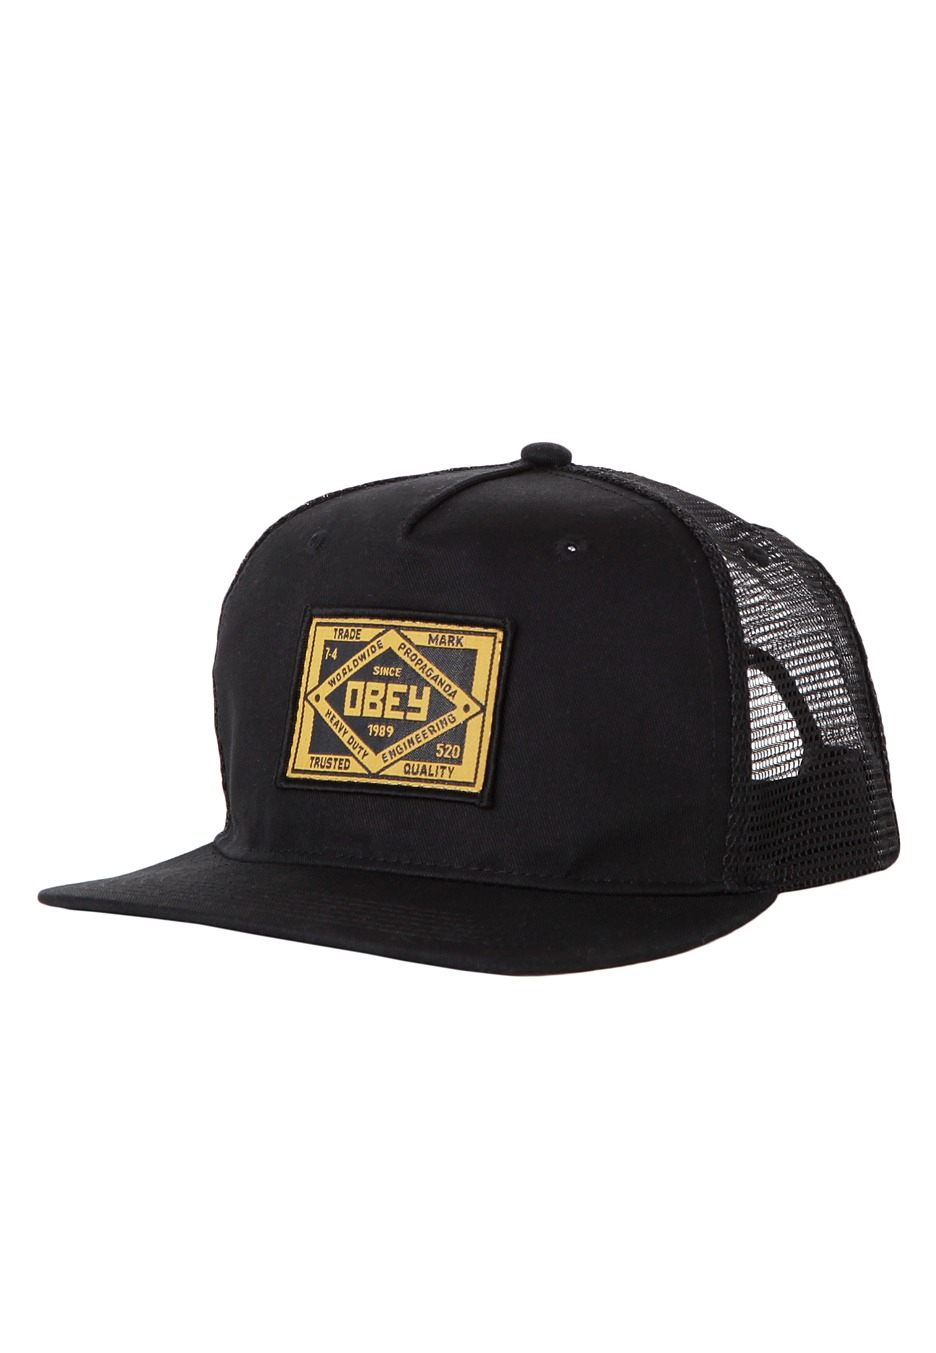 Obey - Trademark Trucker - Cap - Streetwear Shop - Impericon.com Worldwide 6e5e6728a86